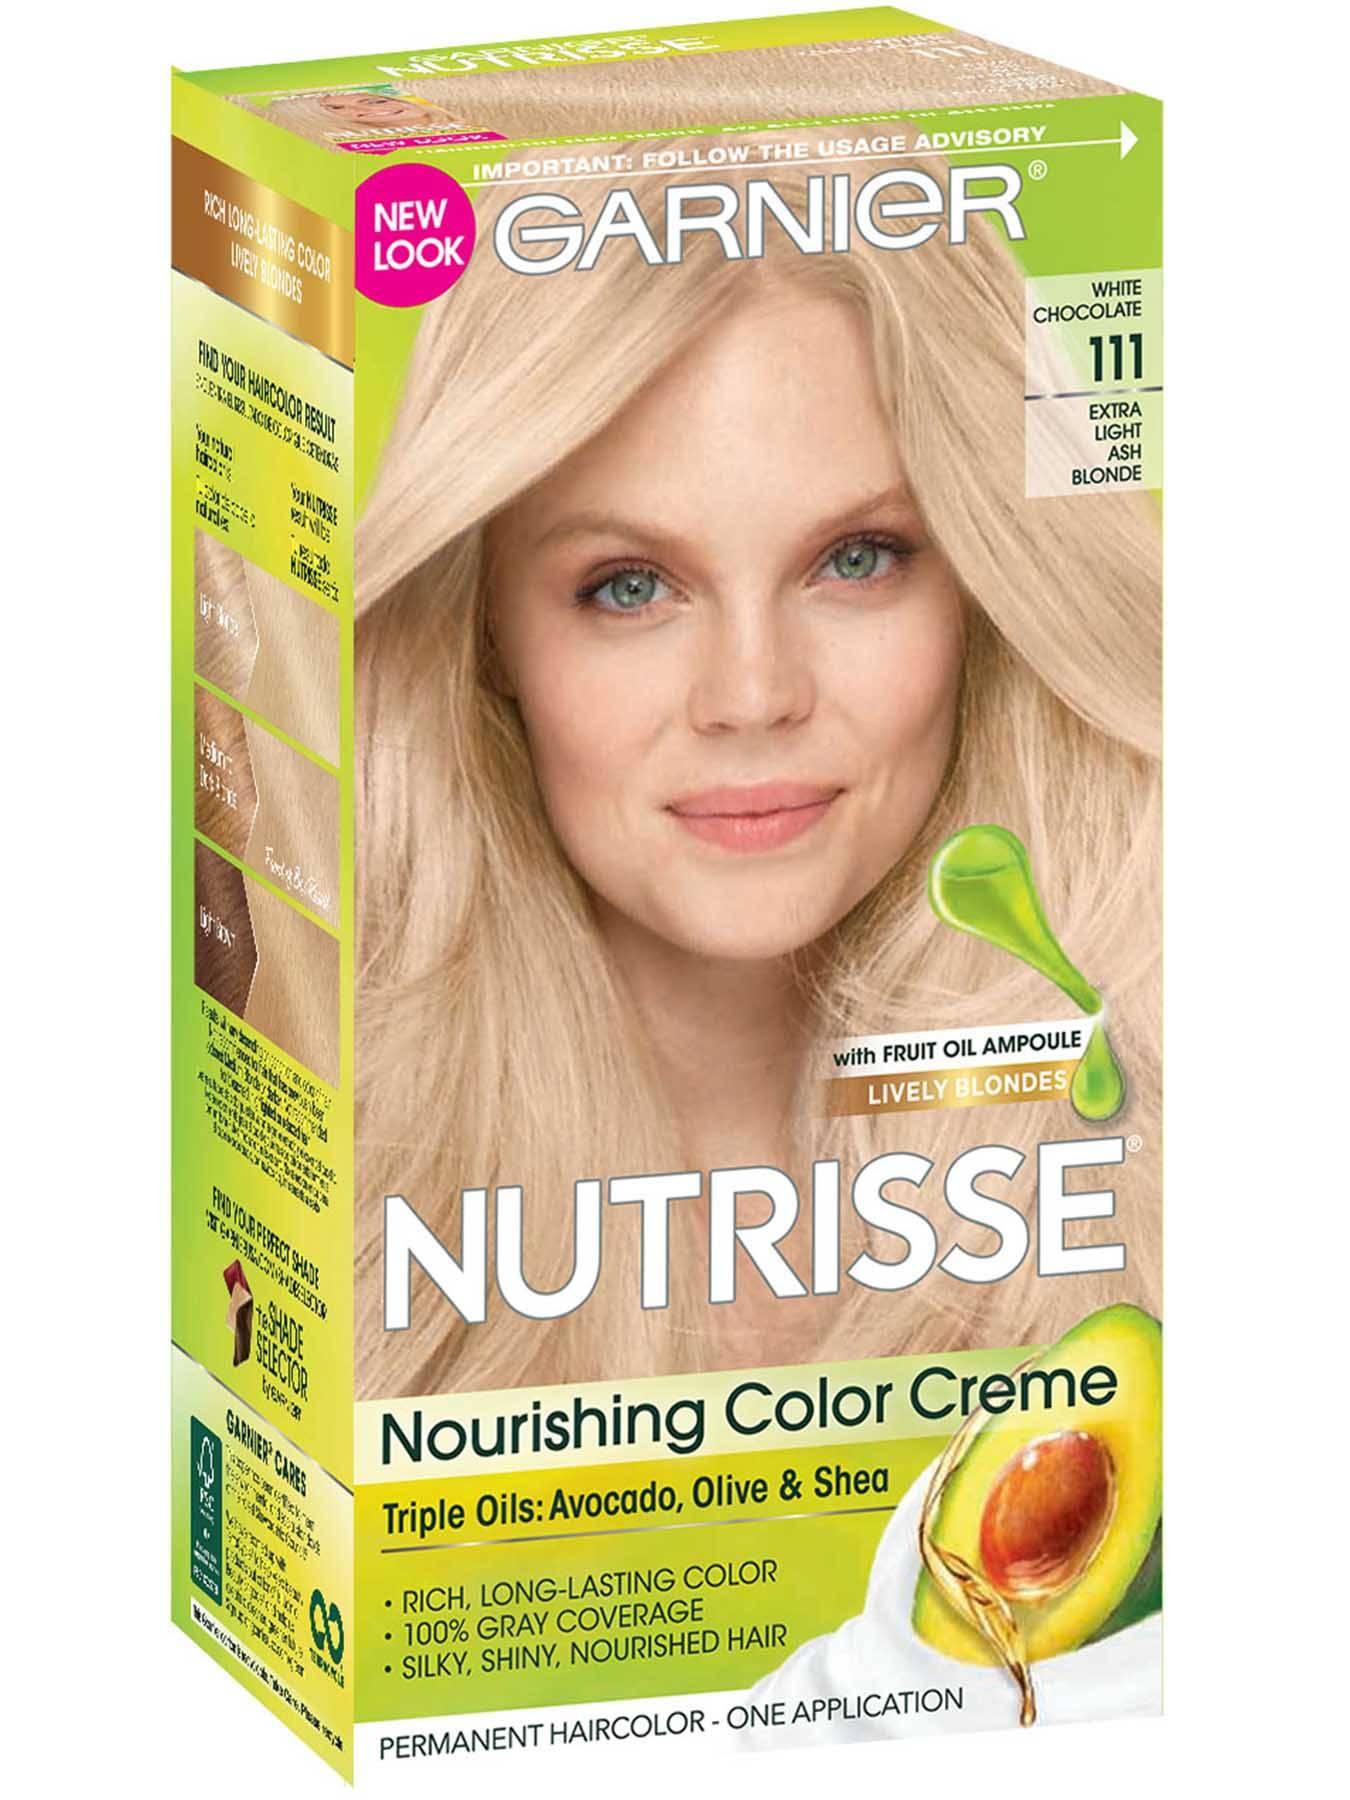 Blonde Hair Color Nutrisse Color Creme Nourishing